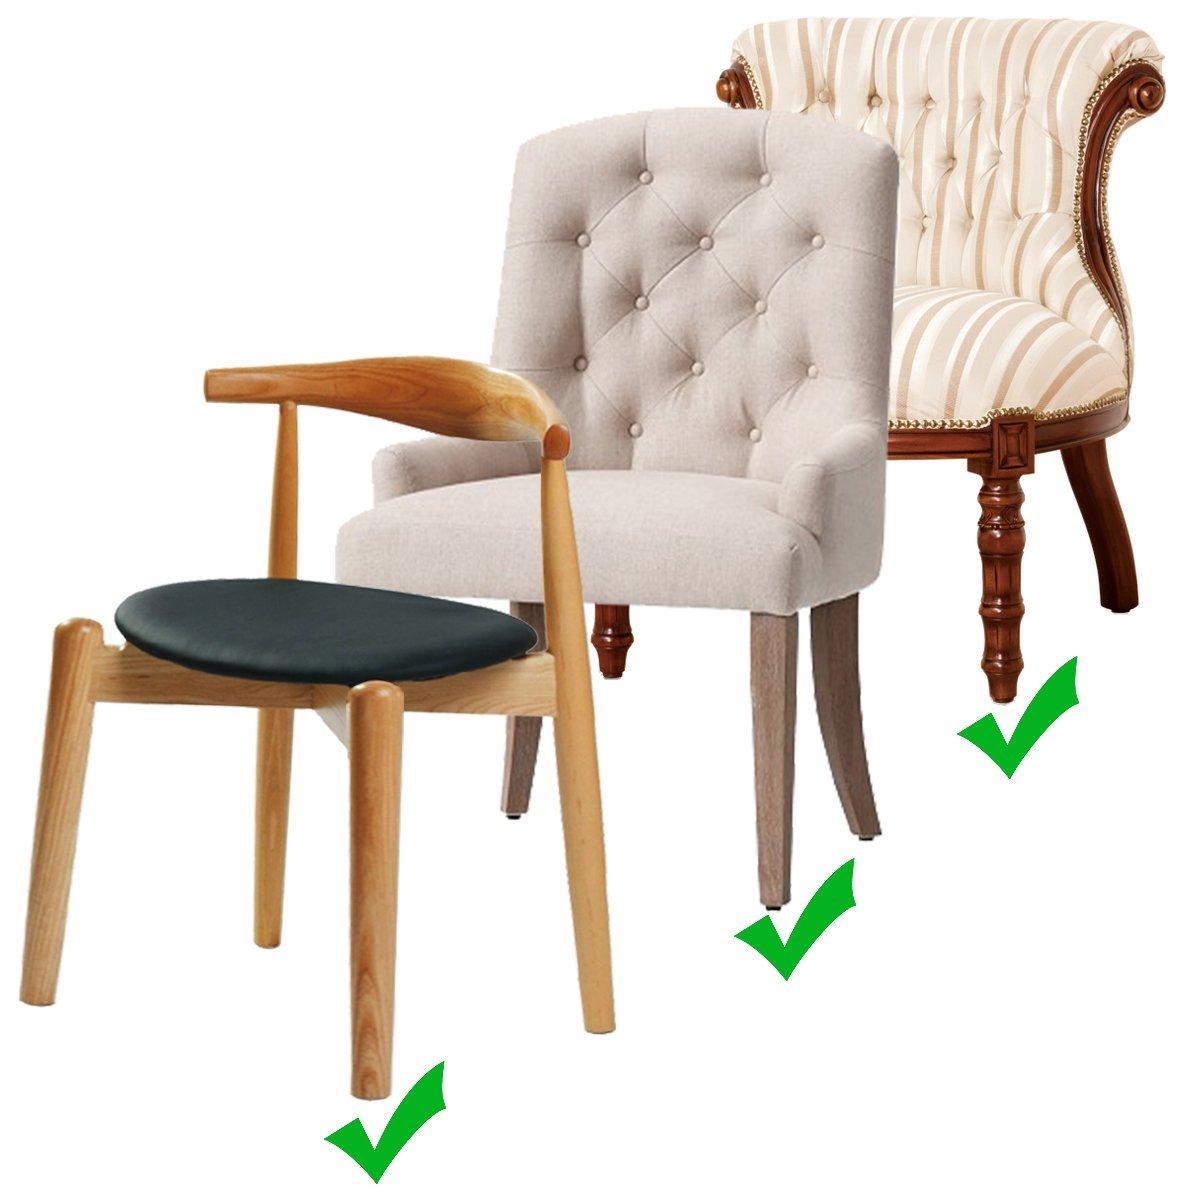 Melonboat Chair Leg Floor Protectors With Felt Furniture